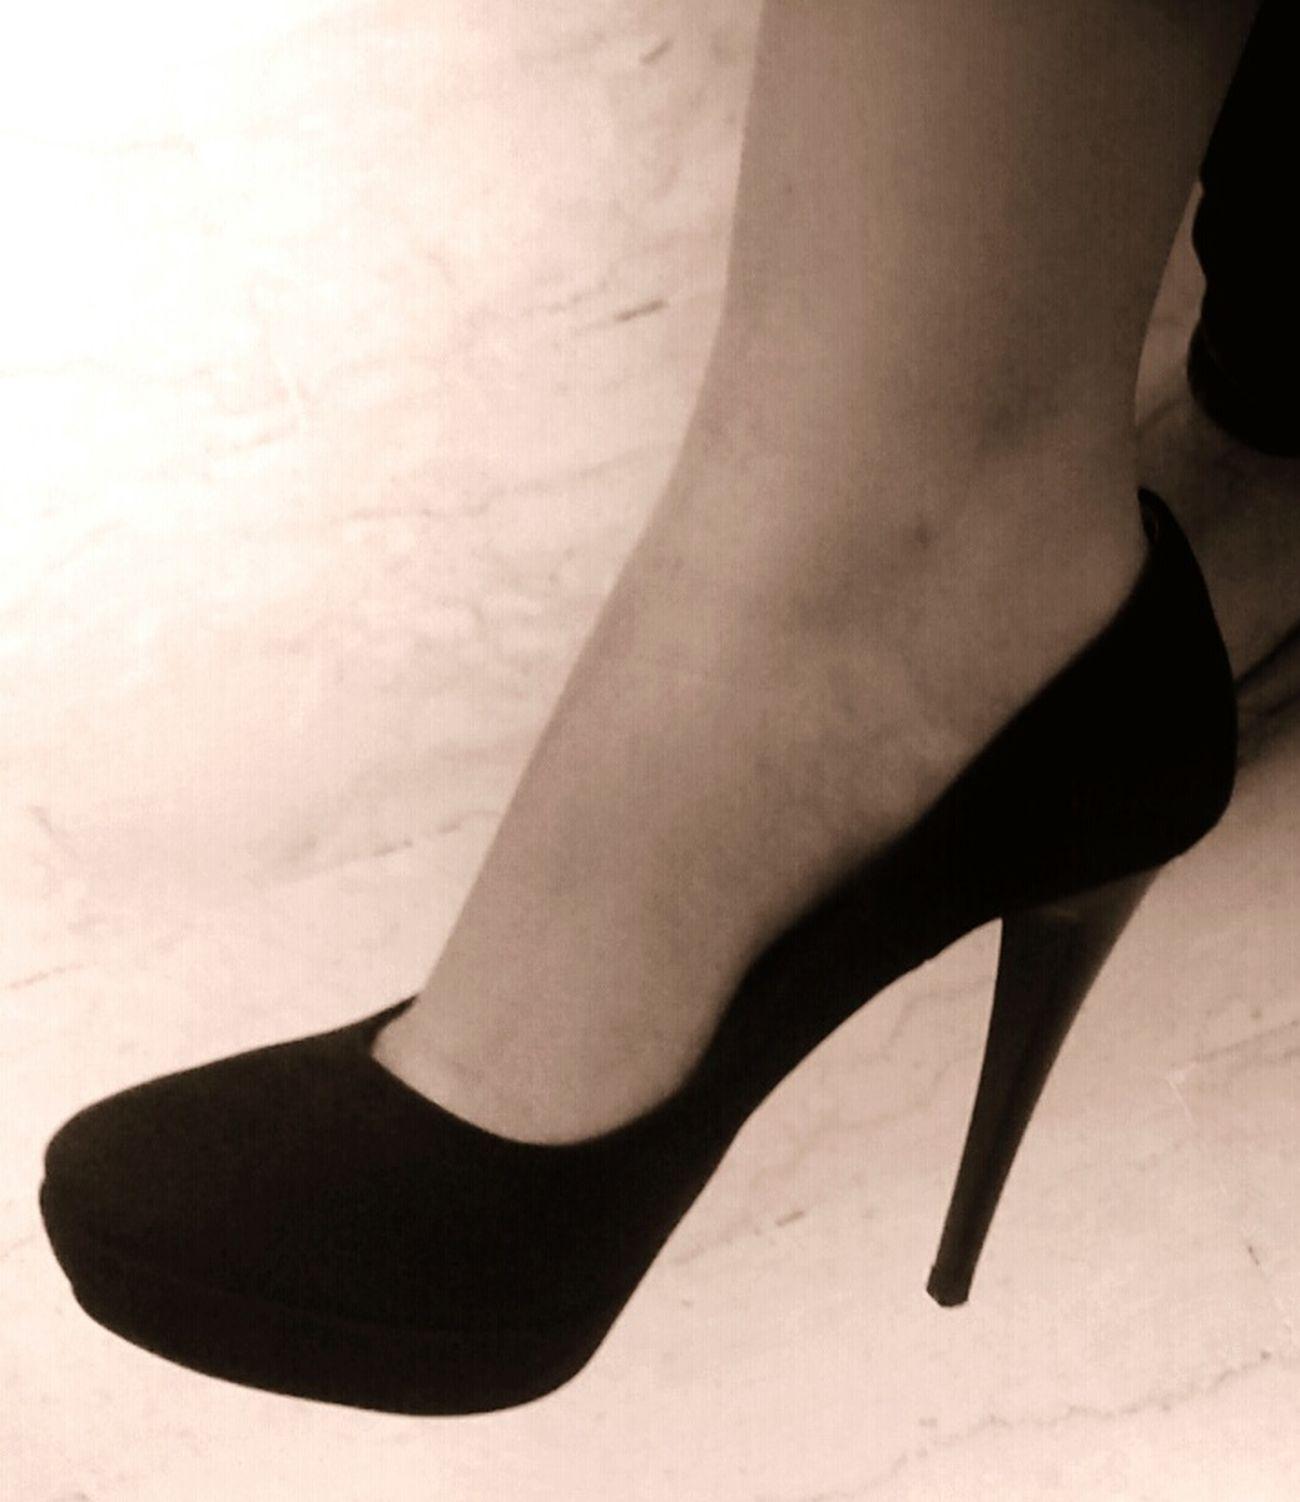 Hi! Taking Photos That's Me Sensualgirl Model Pose Sicilian Girl Fitting Room Feetlove Feet Feetselfie Heels Heels Heels Shoes Sexyfeet Sexyness Sexyshoes Sexyheels Elegant